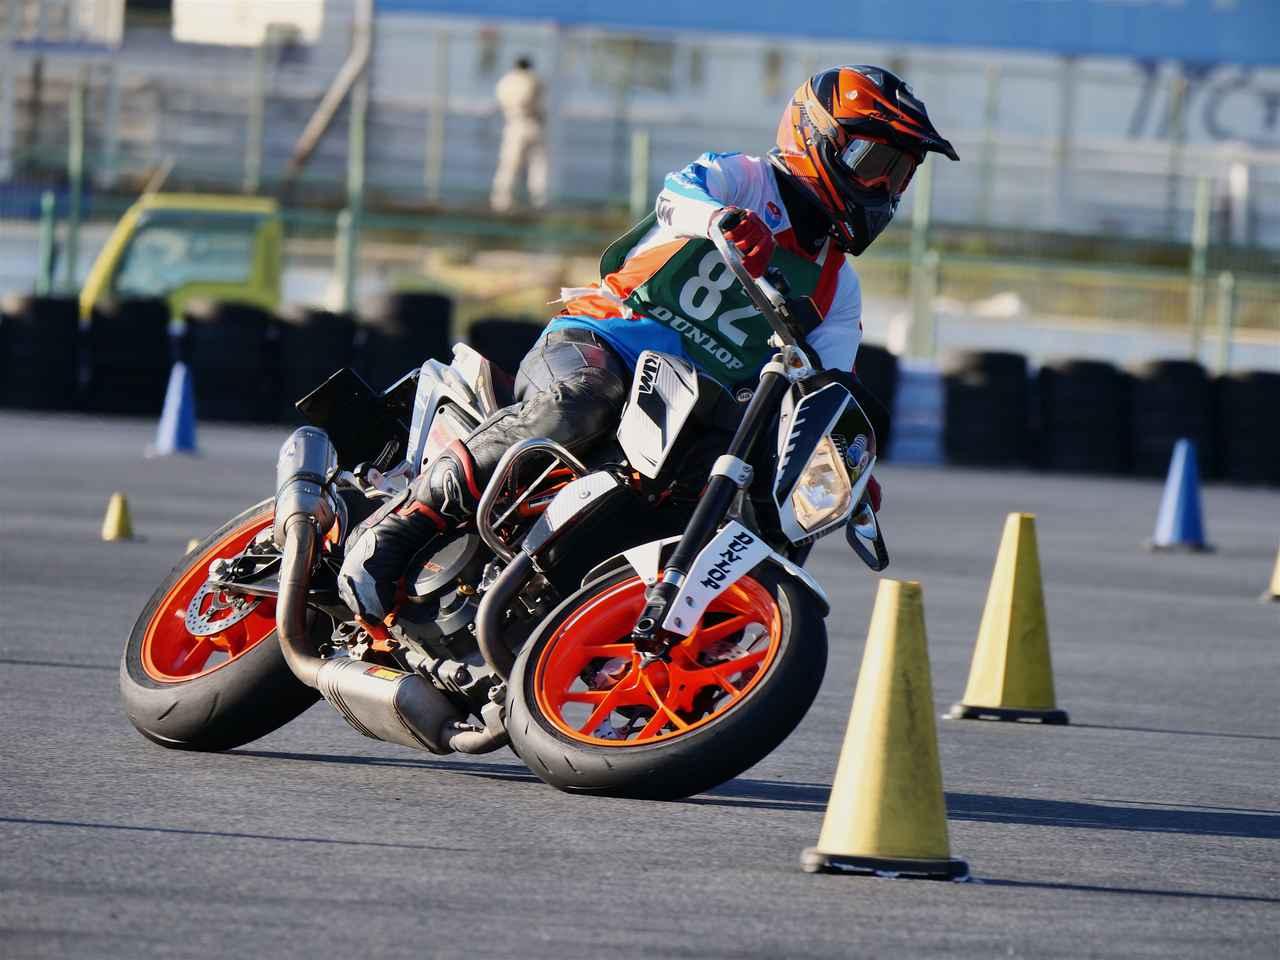 Images : 6番目の画像 - 2019ダンロップ・オートバイ杯ジムカーナ第5戦 - webオートバイ